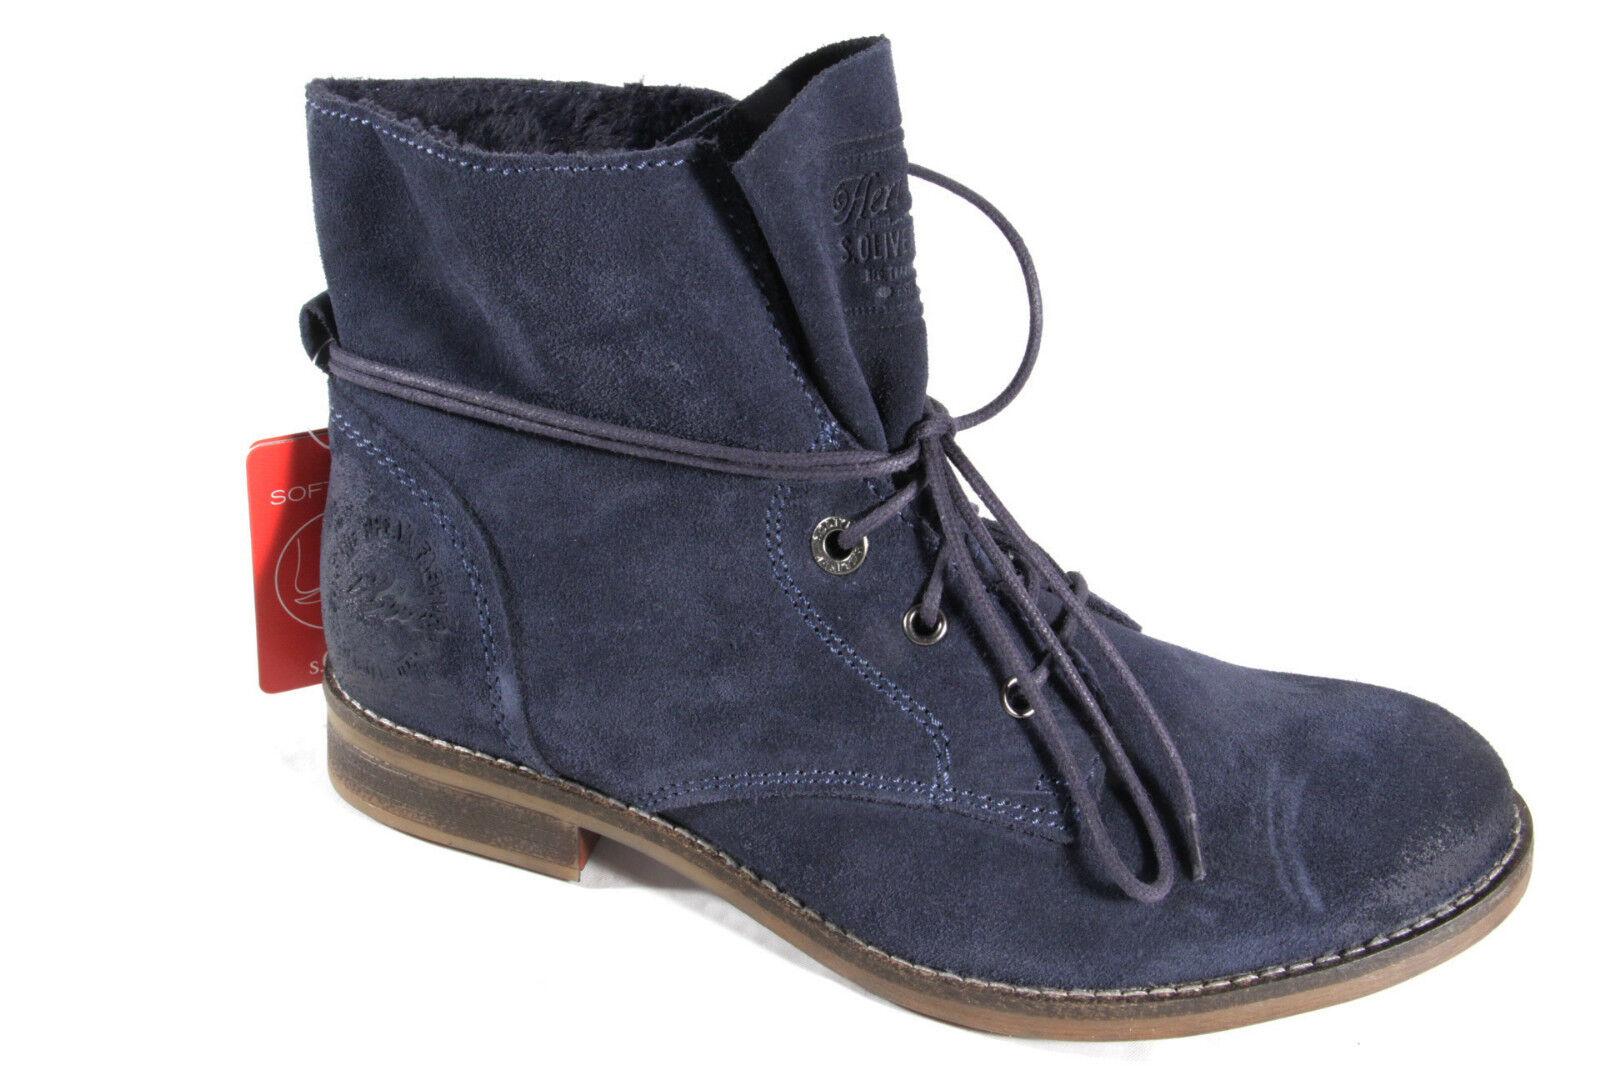 S.Oliver  Stiefel, Stiefelette, Boots, Velourleder,  S.Oliver blau, gefüttert NEU 53ba27